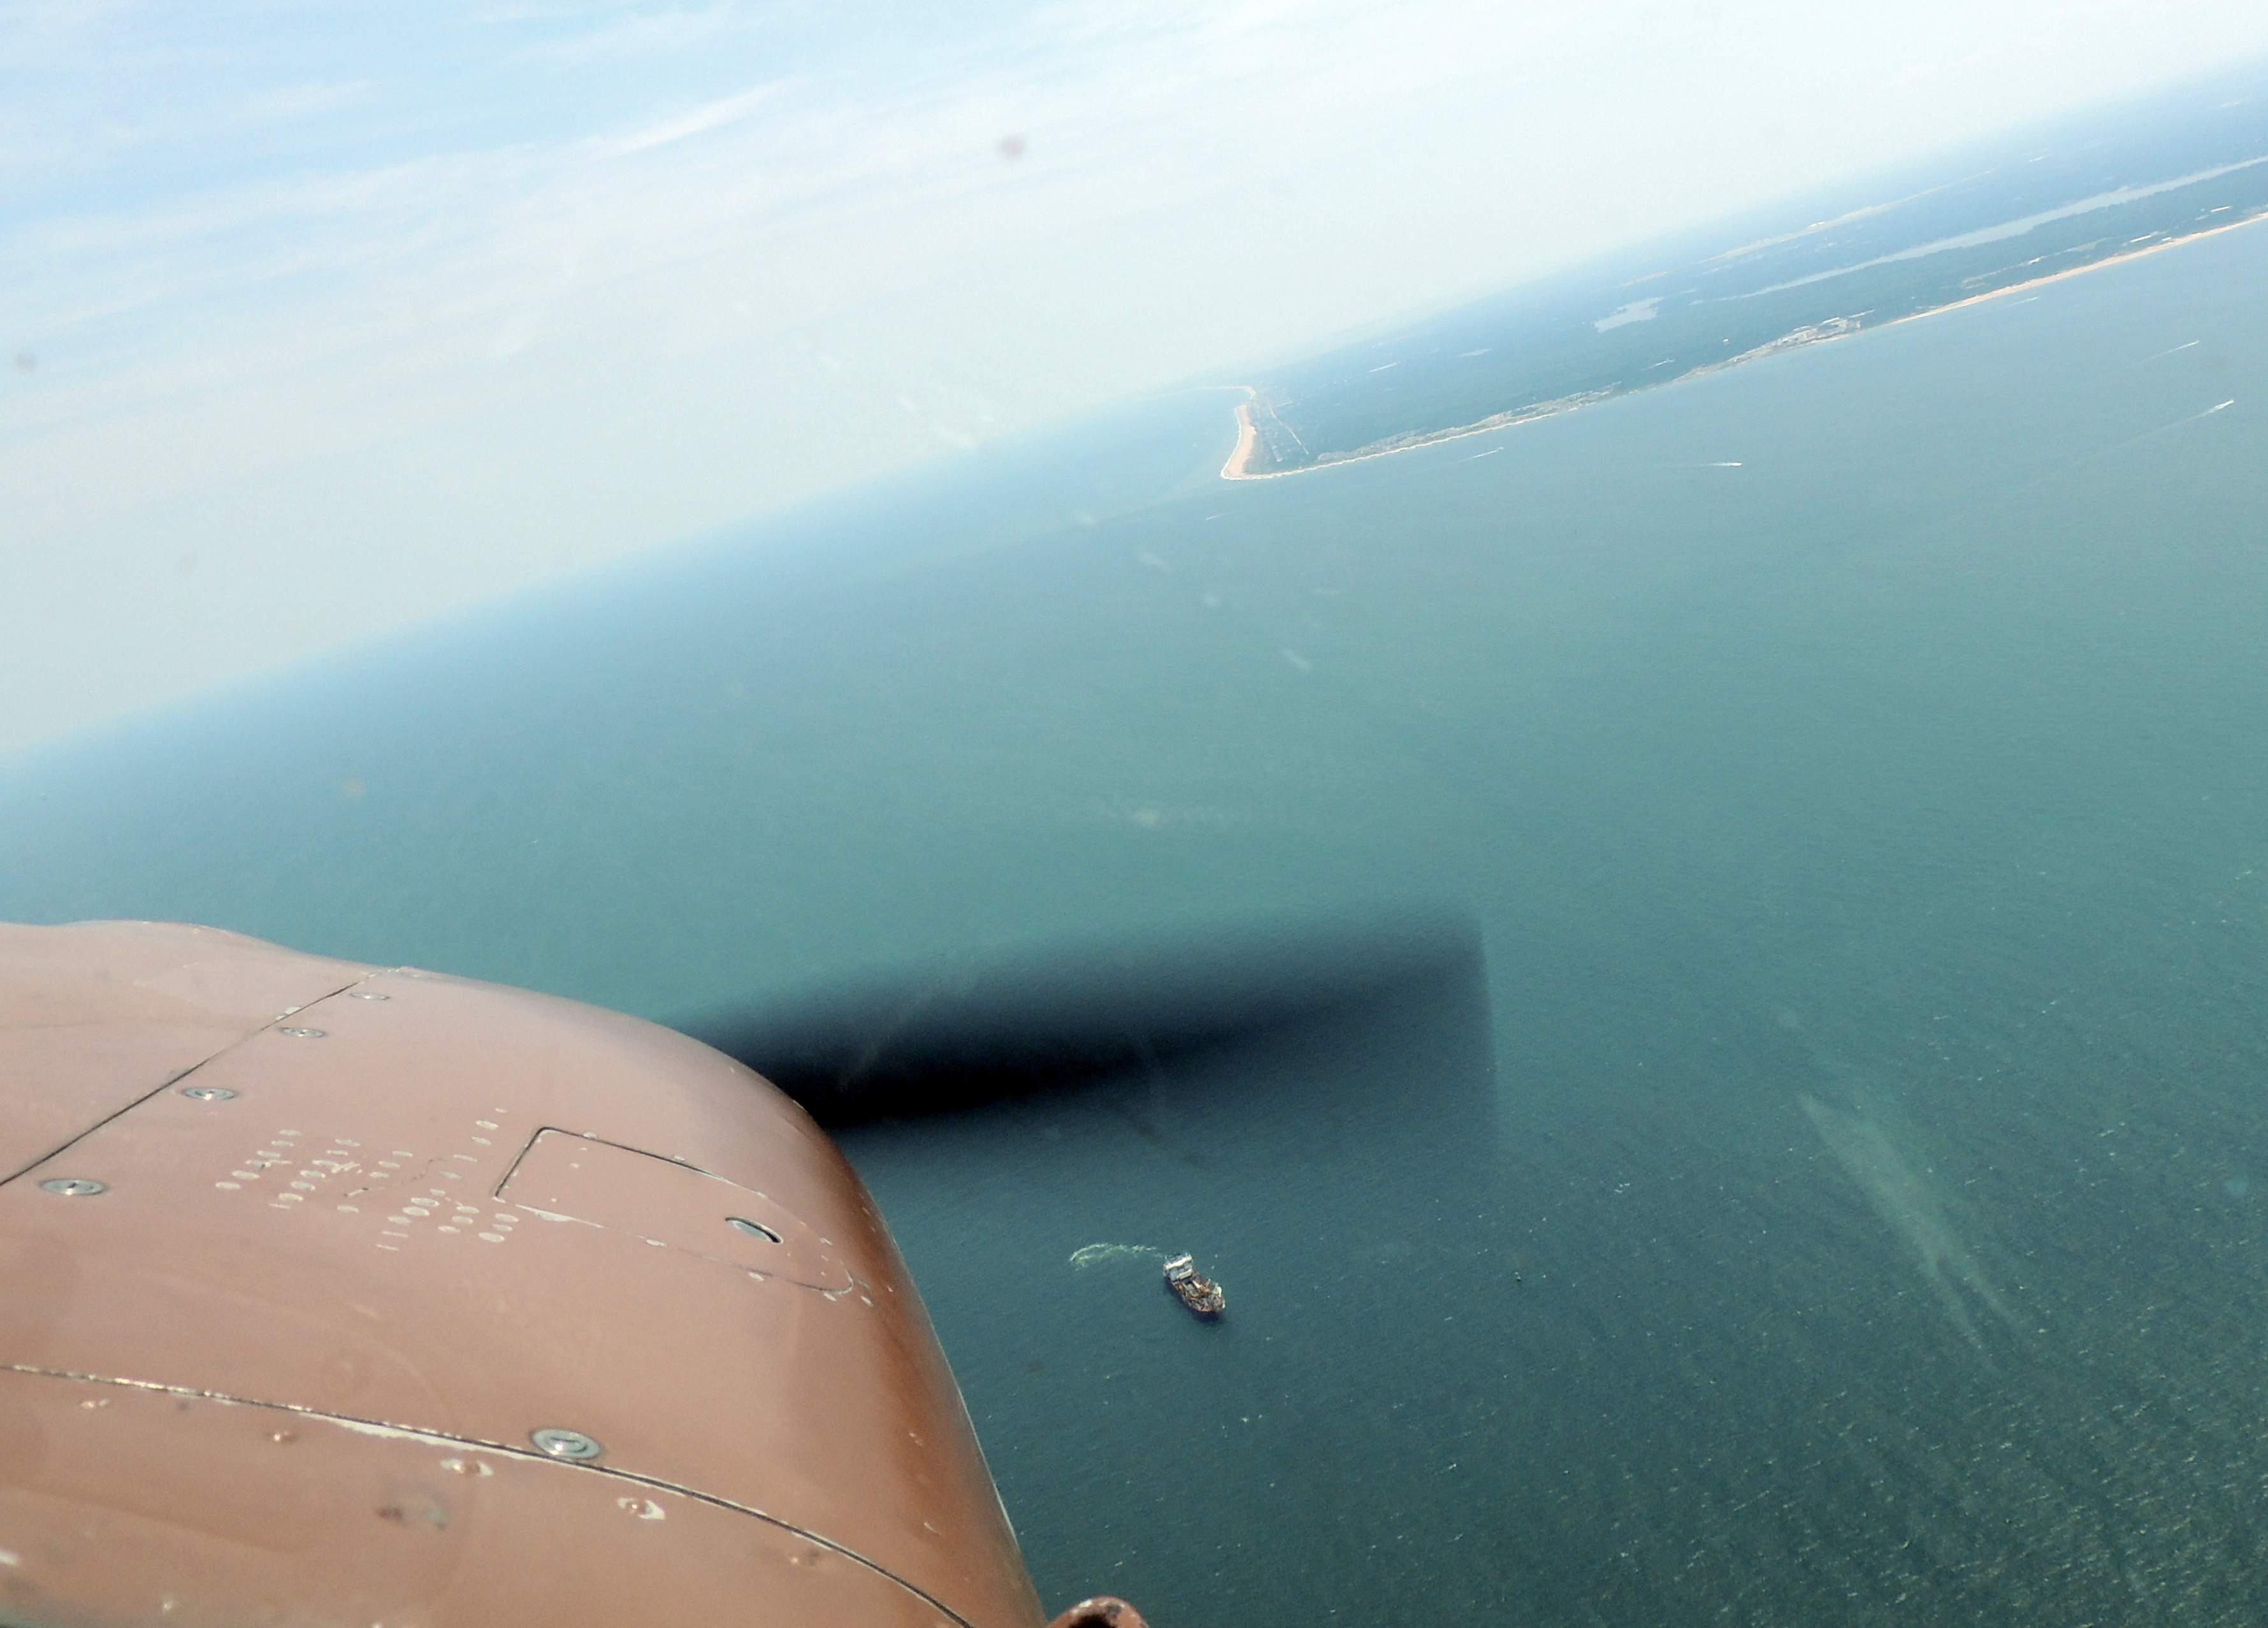 Over the Atlantic looking southwest towards Virginia Beach